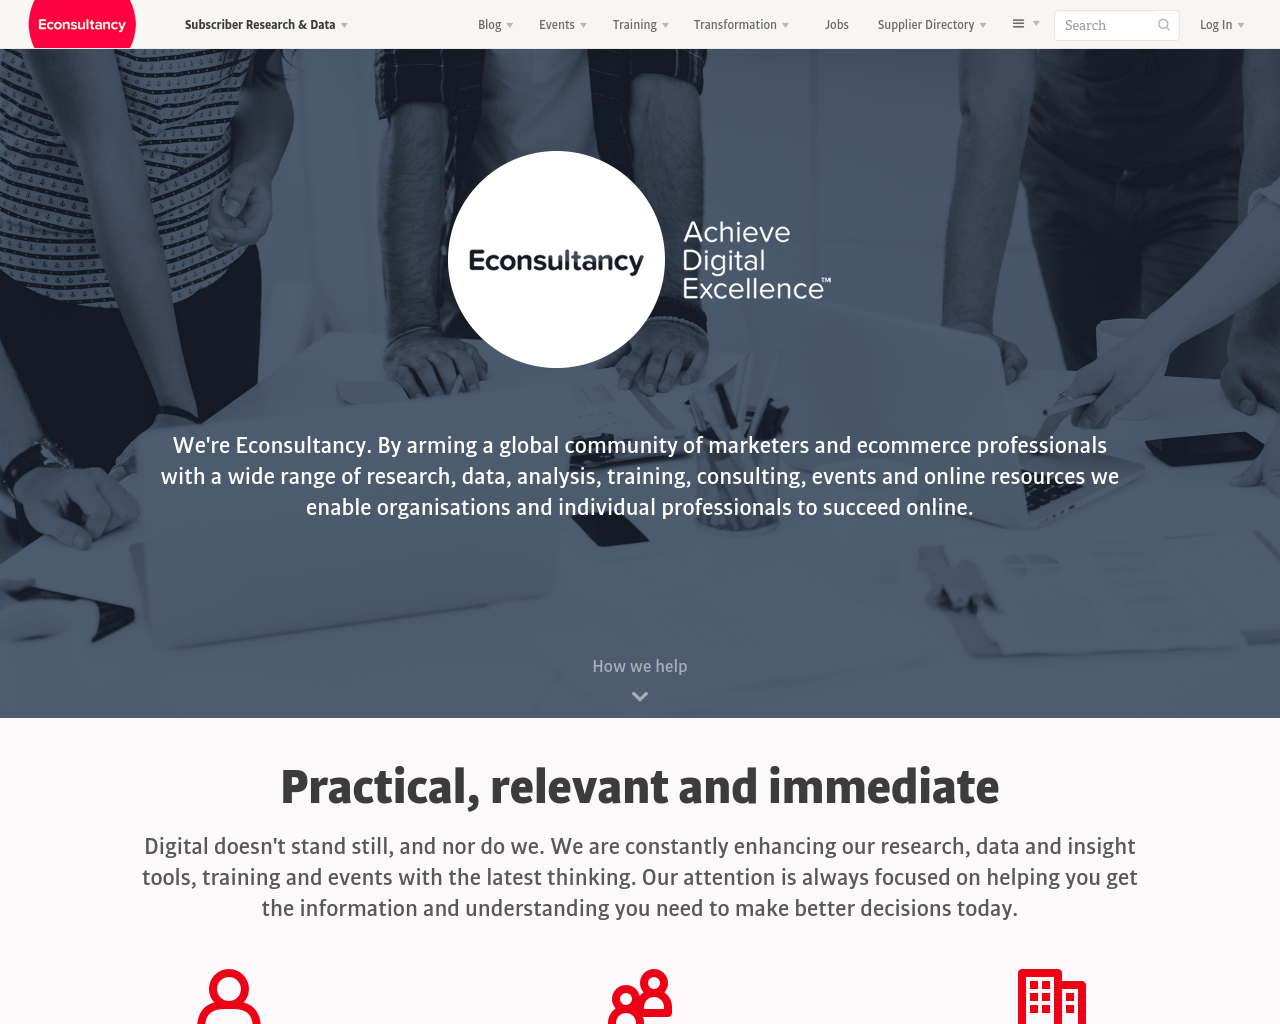 Econsultancy.com-Advertising-Reviews-Pricing